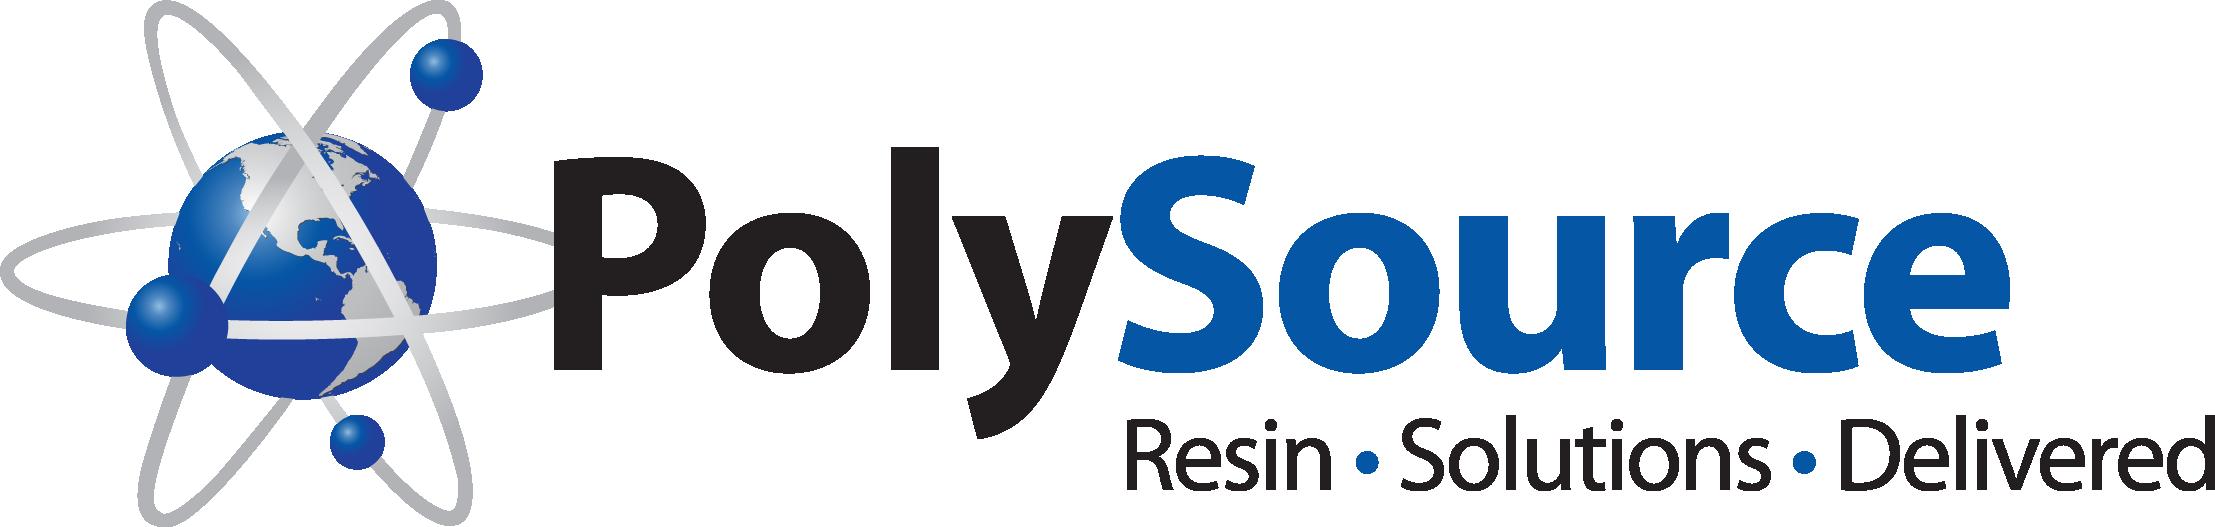 polysource